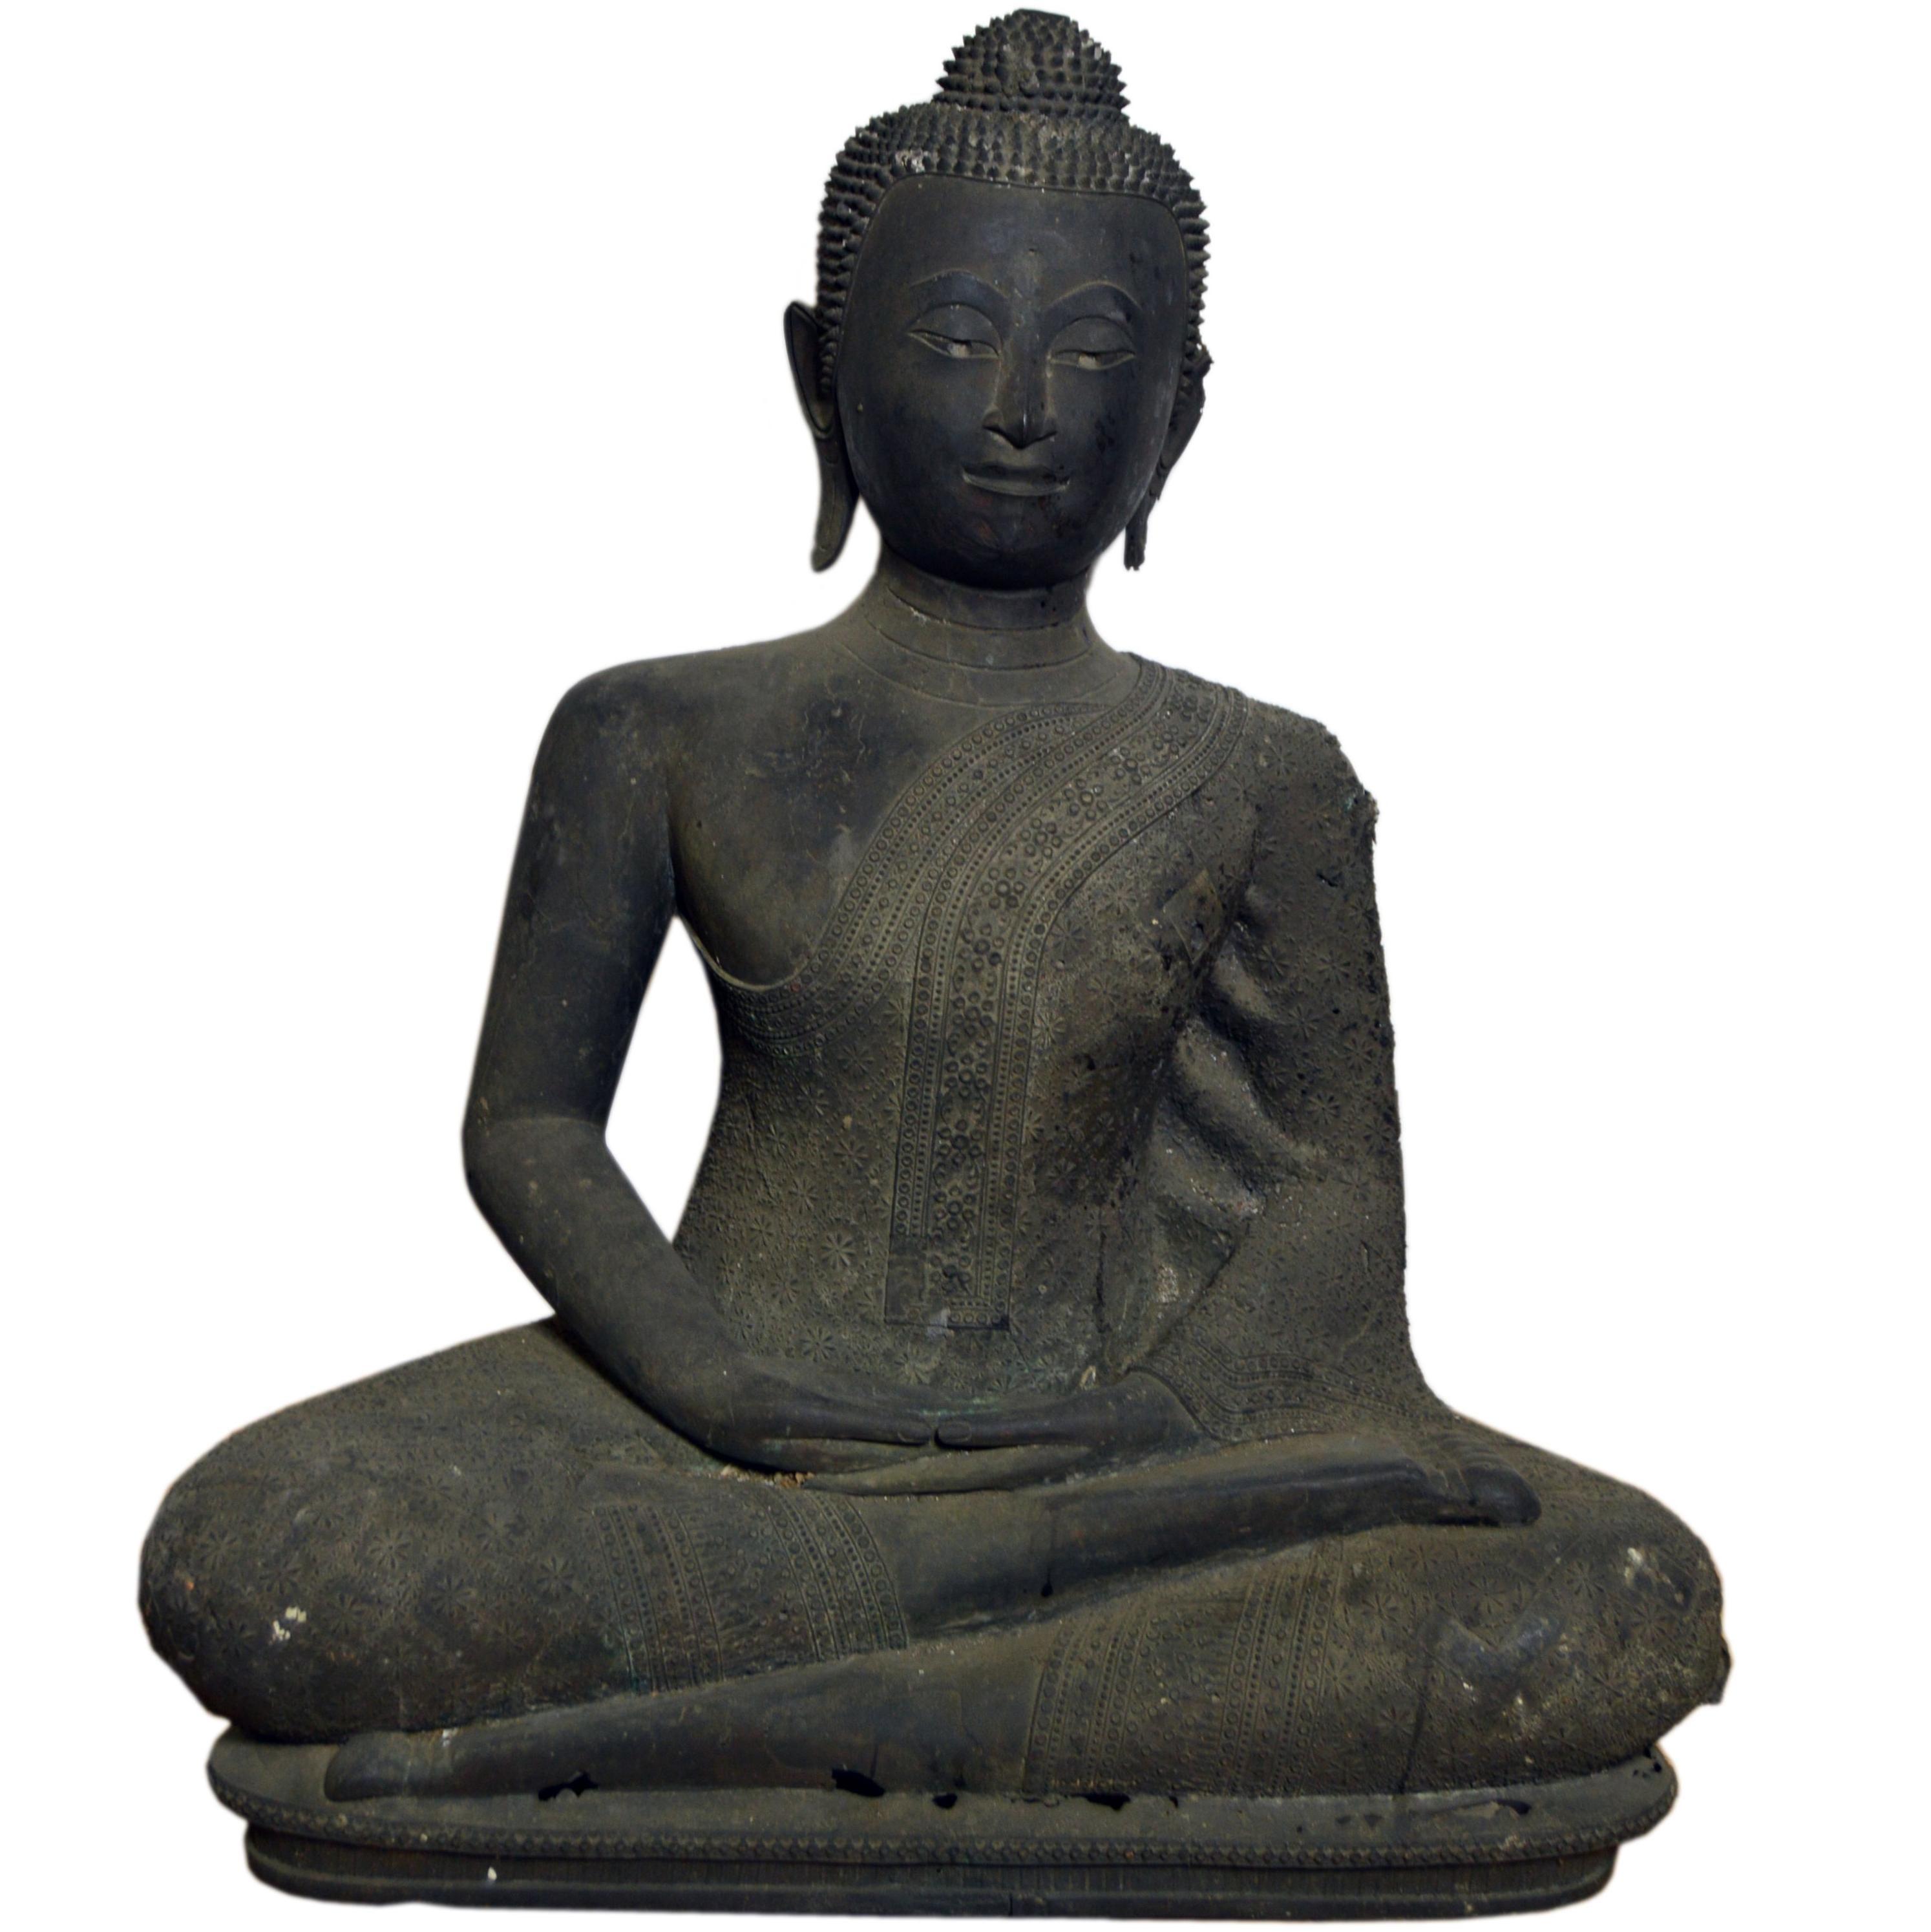 Thai Turn of the Century Bronze Seated Buddha Sculpture with Dark Patina